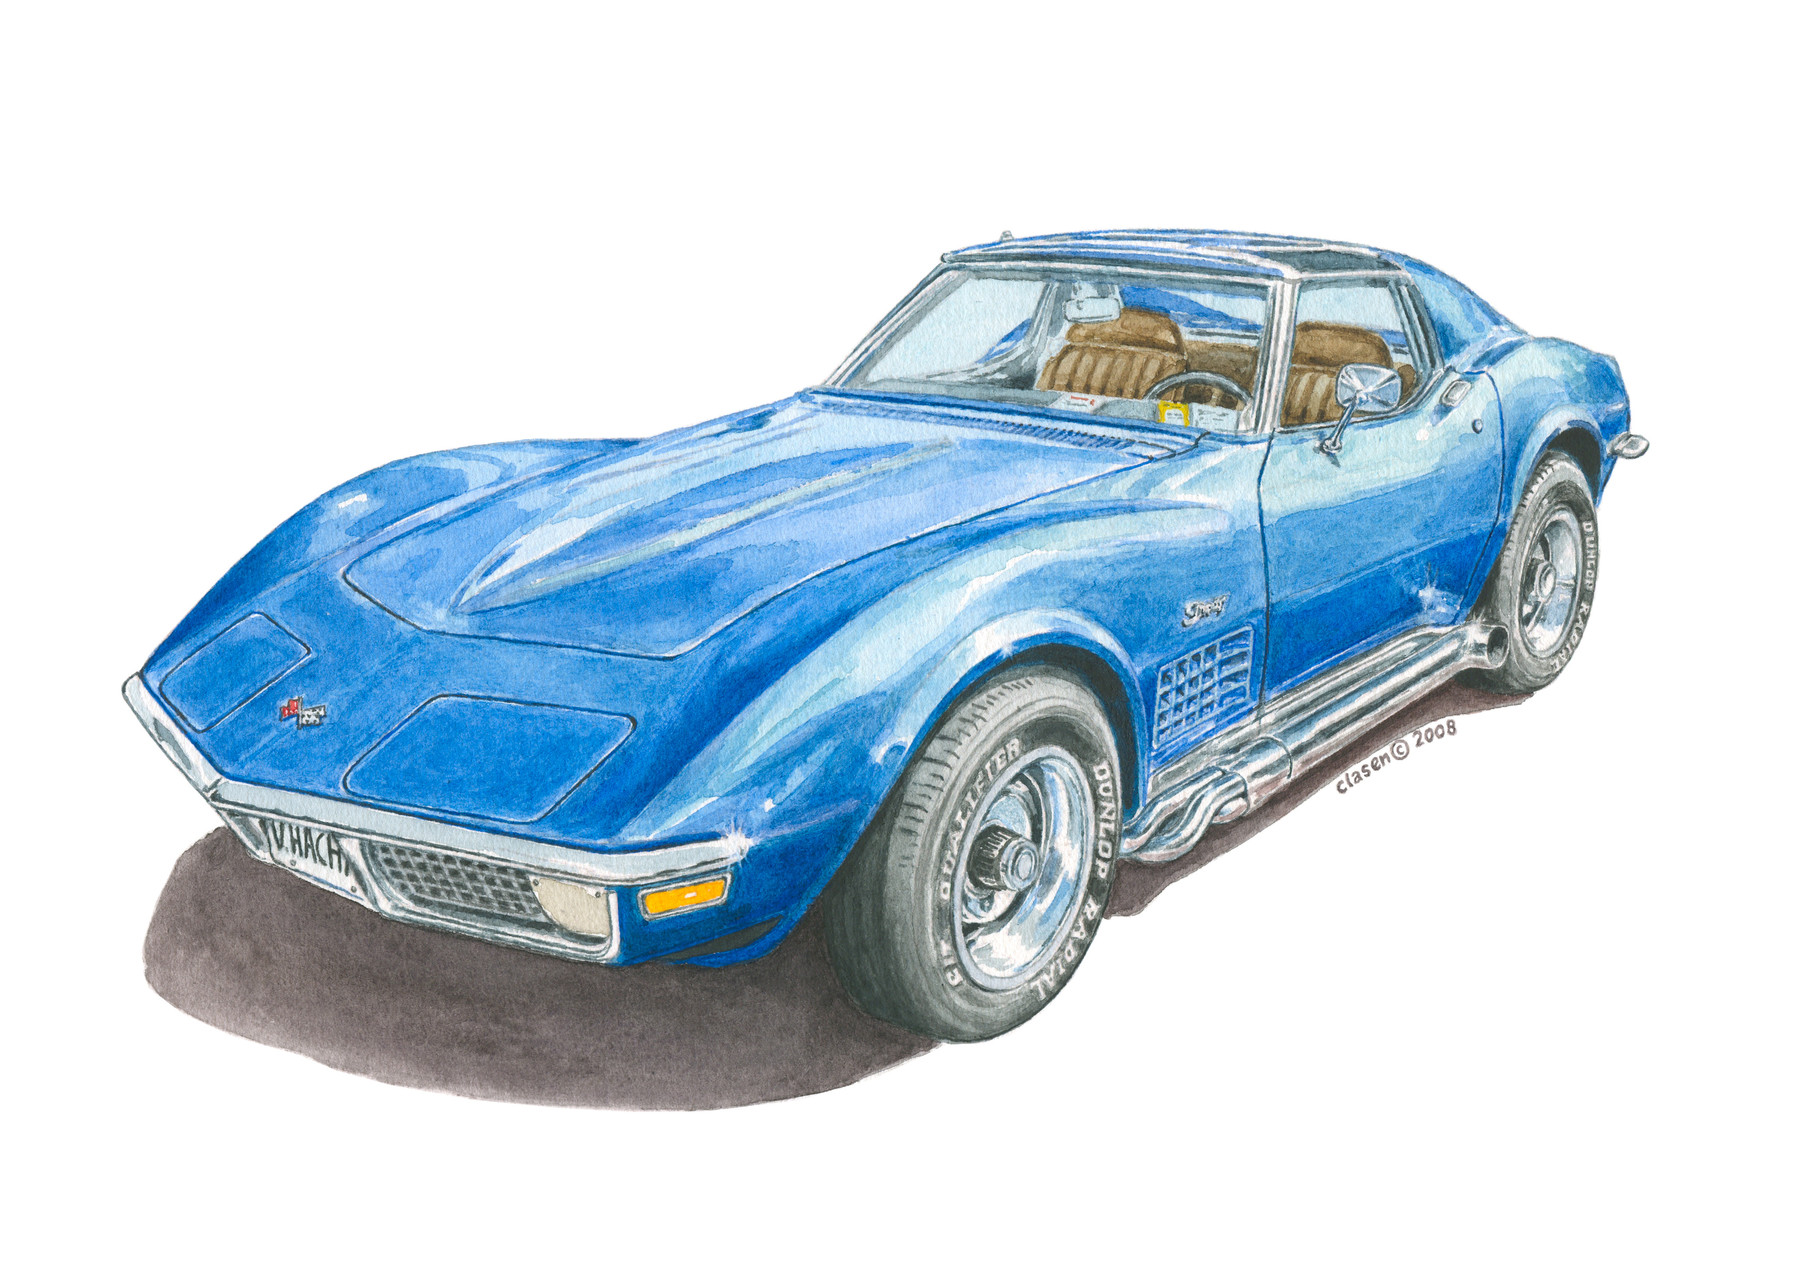 Corvette, Aquarell auf Papier, 2008